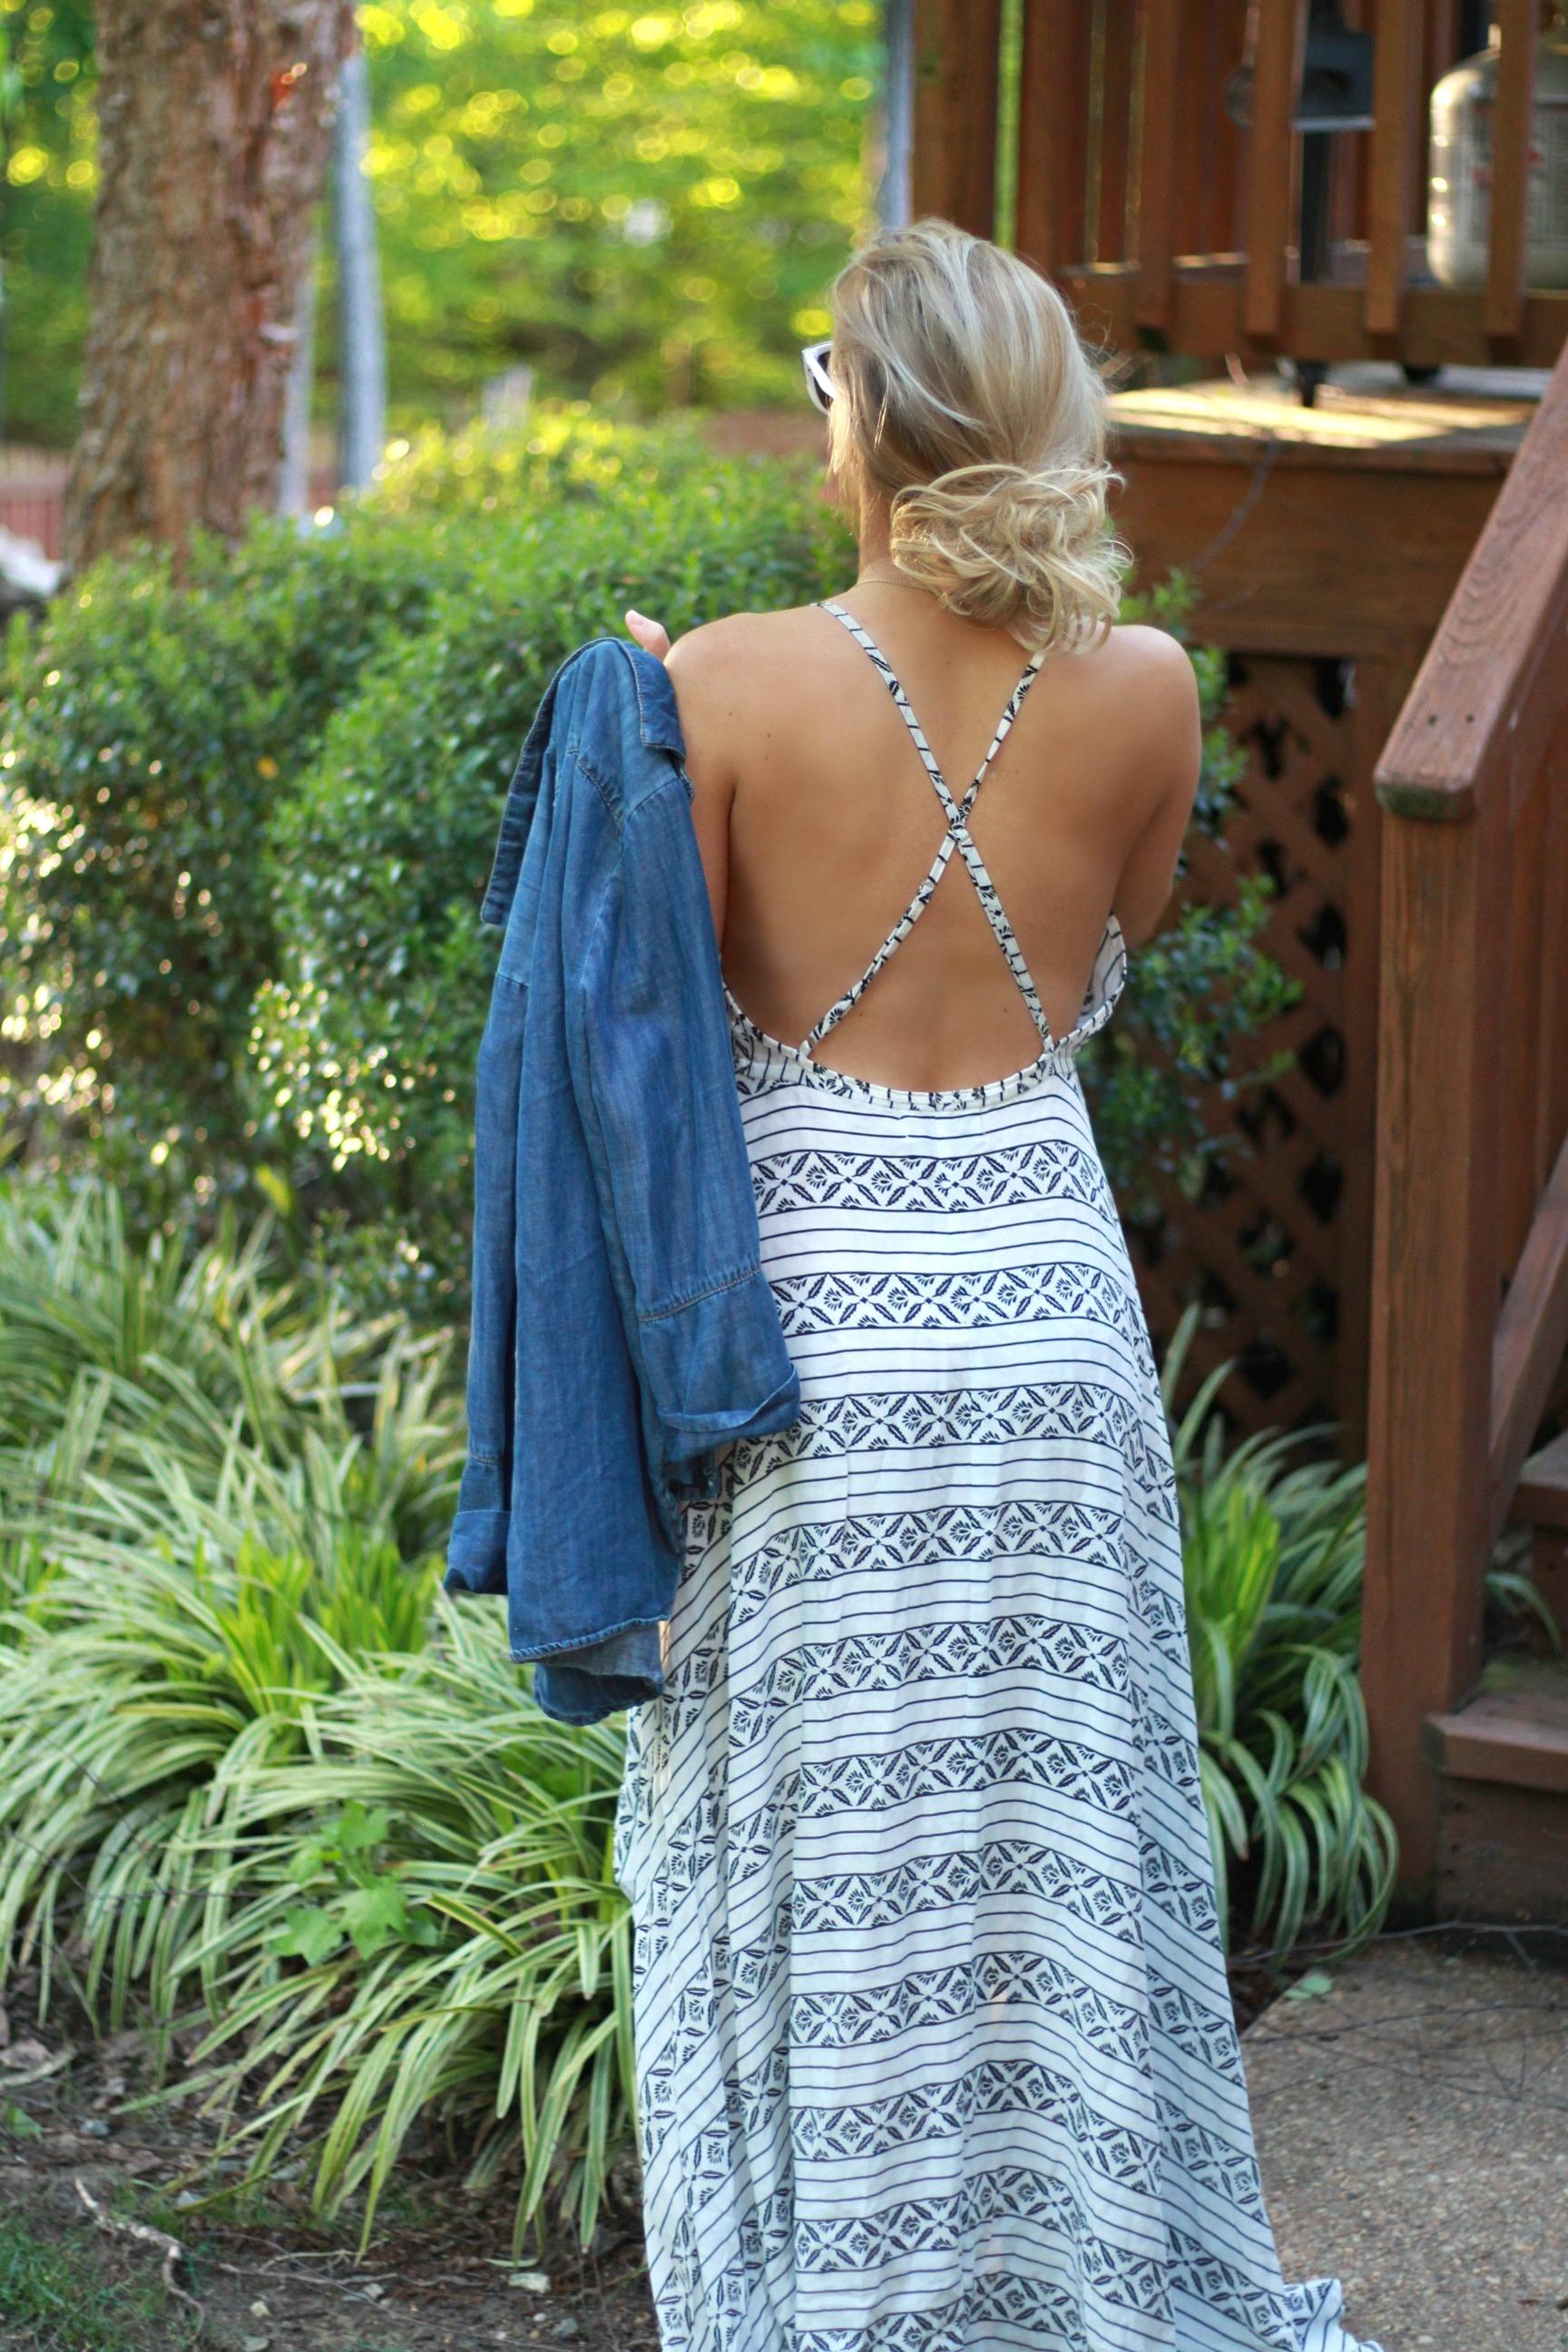 Kissbobo bra, how to wear a backless dress